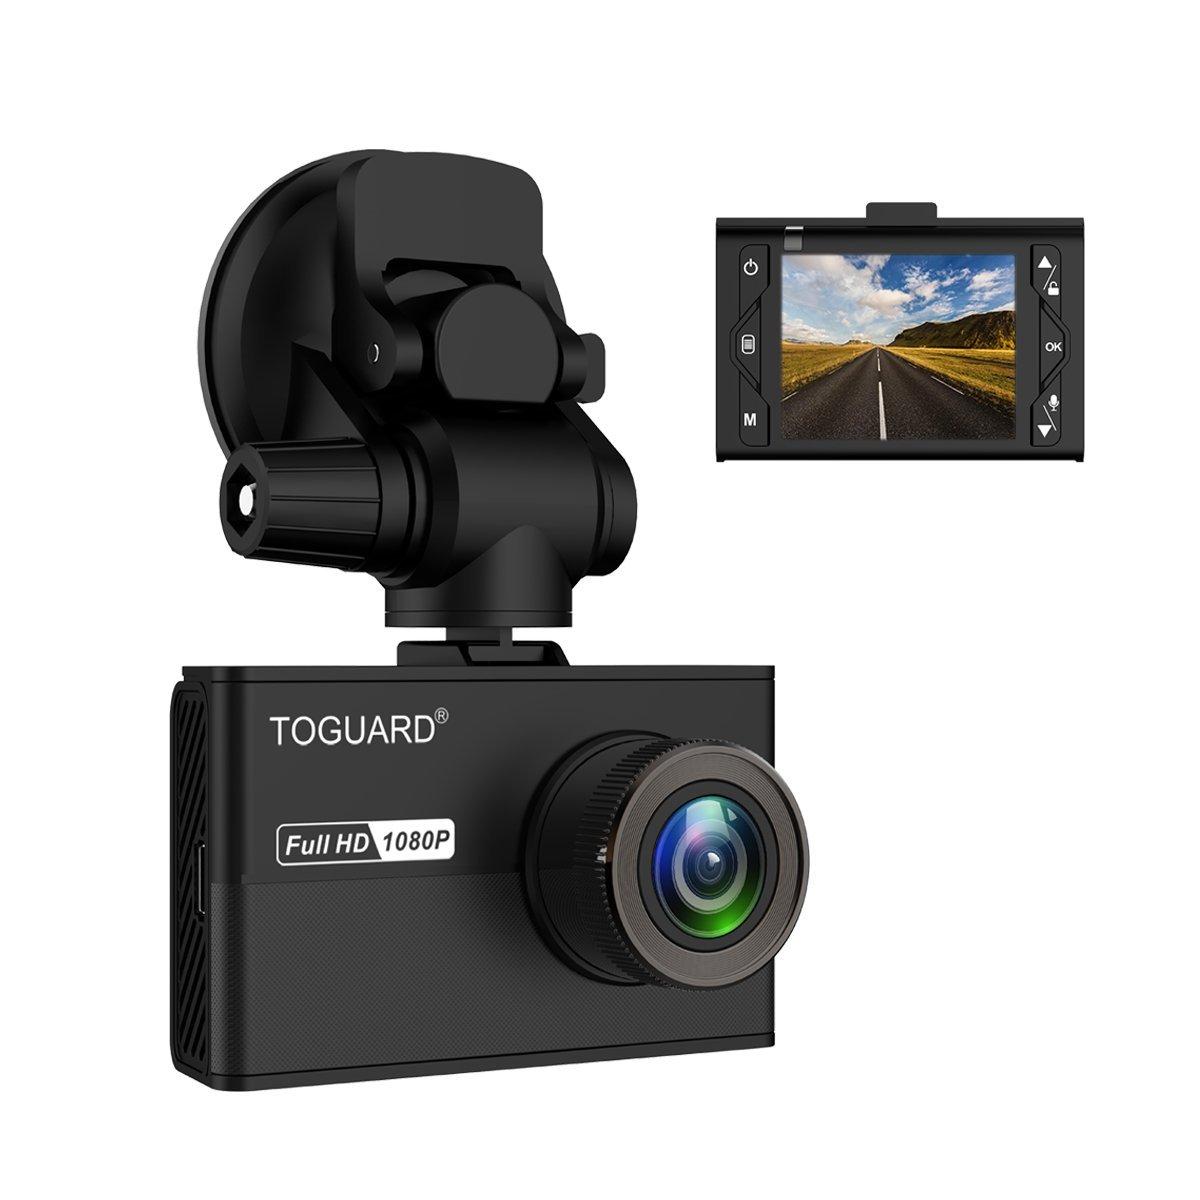 TOGUARD Dashcam Full HD 1080P, Auto Kamera 170° Weitwinkelobjektiv mit 1.5' LCD, Mini Auto Dashcam mit Super Kondensator, SONY Exmor Sensor, Loop-Aufnahmen, G-sensor, Bewegungserkennung Auto Kamera 170° Weitwinkelobjektiv mit 1.5 LCD CE65